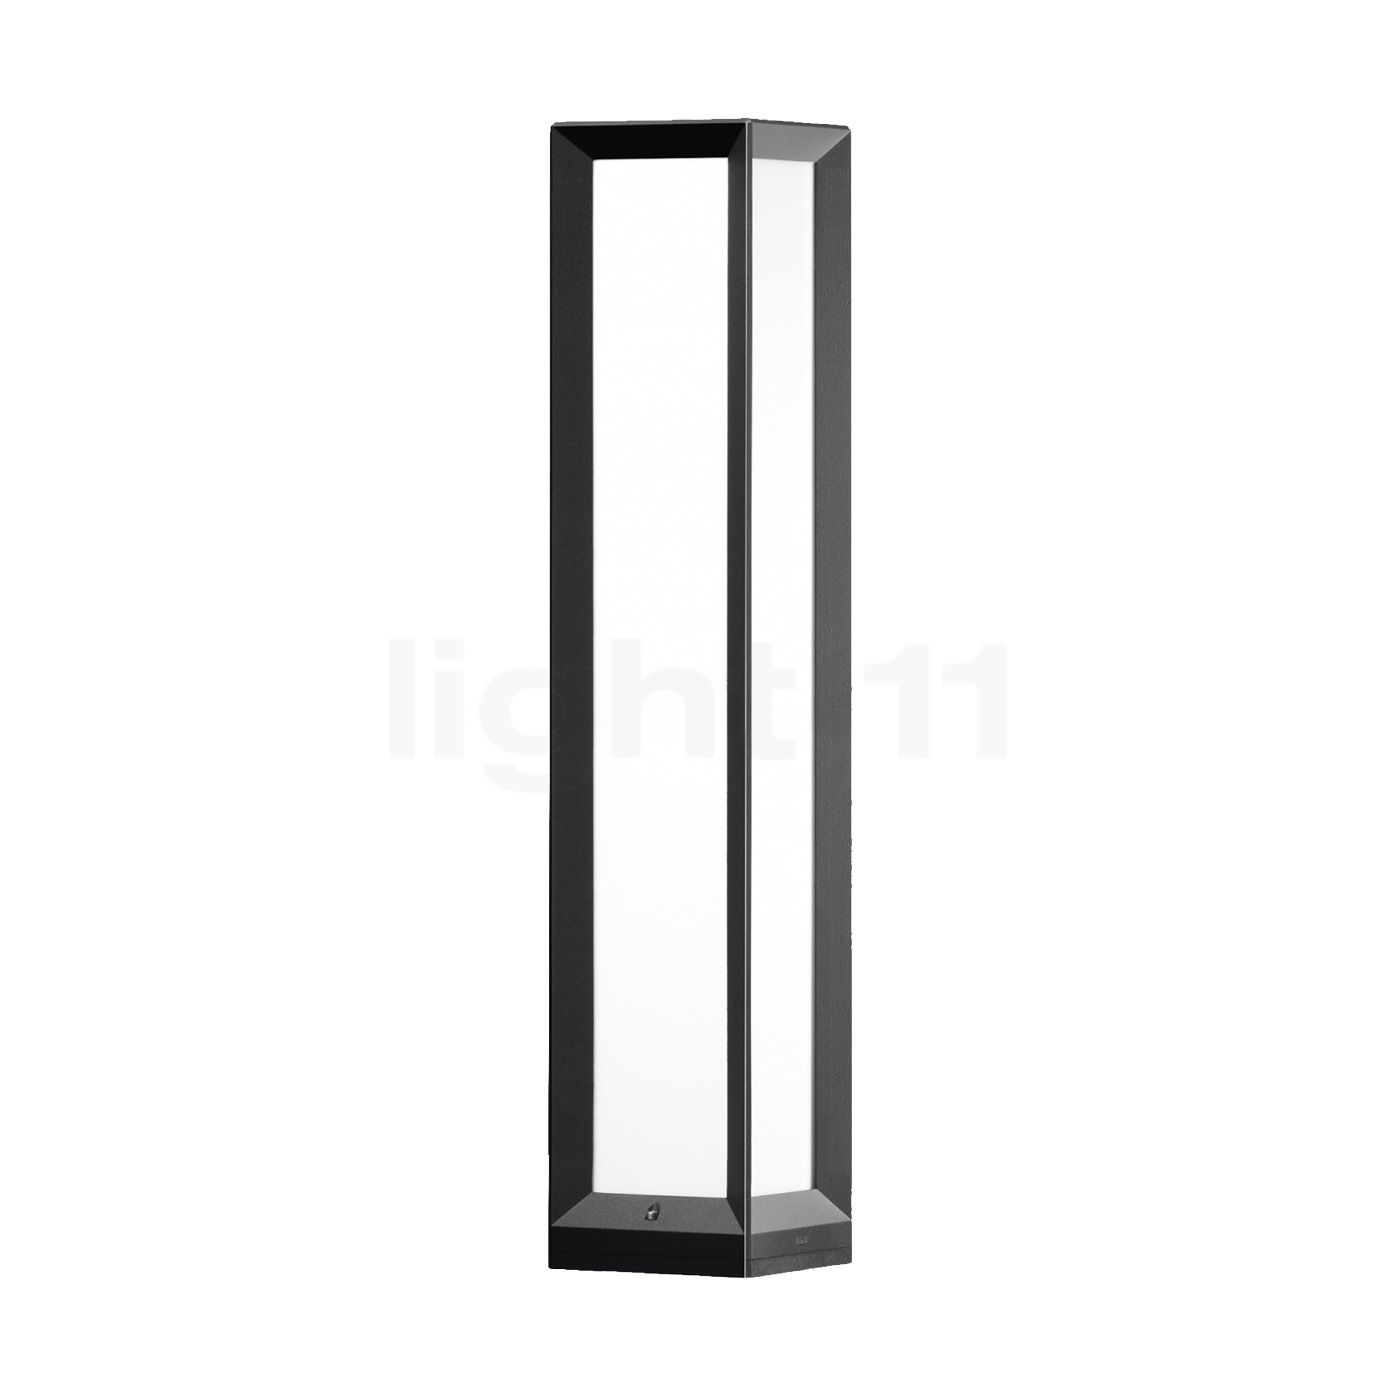 bega 44426 wandleuchte fluo kaufen bei. Black Bedroom Furniture Sets. Home Design Ideas